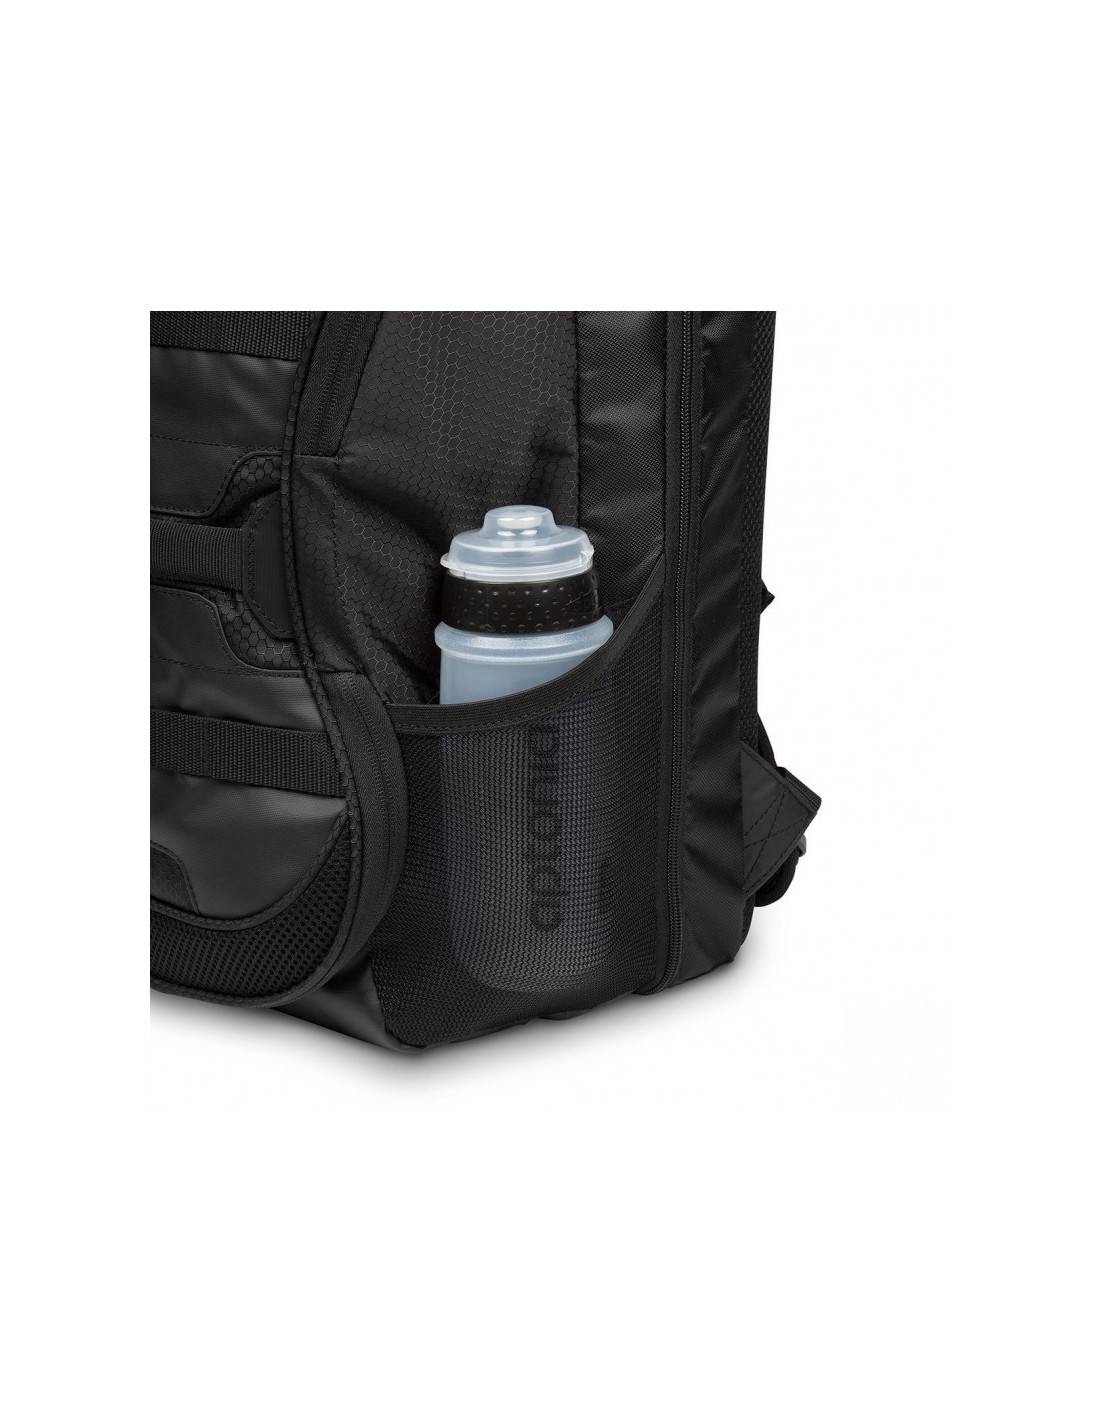 sac dos targus multisports pour pc portable 15 6 noir tsb944eu 70. Black Bedroom Furniture Sets. Home Design Ideas